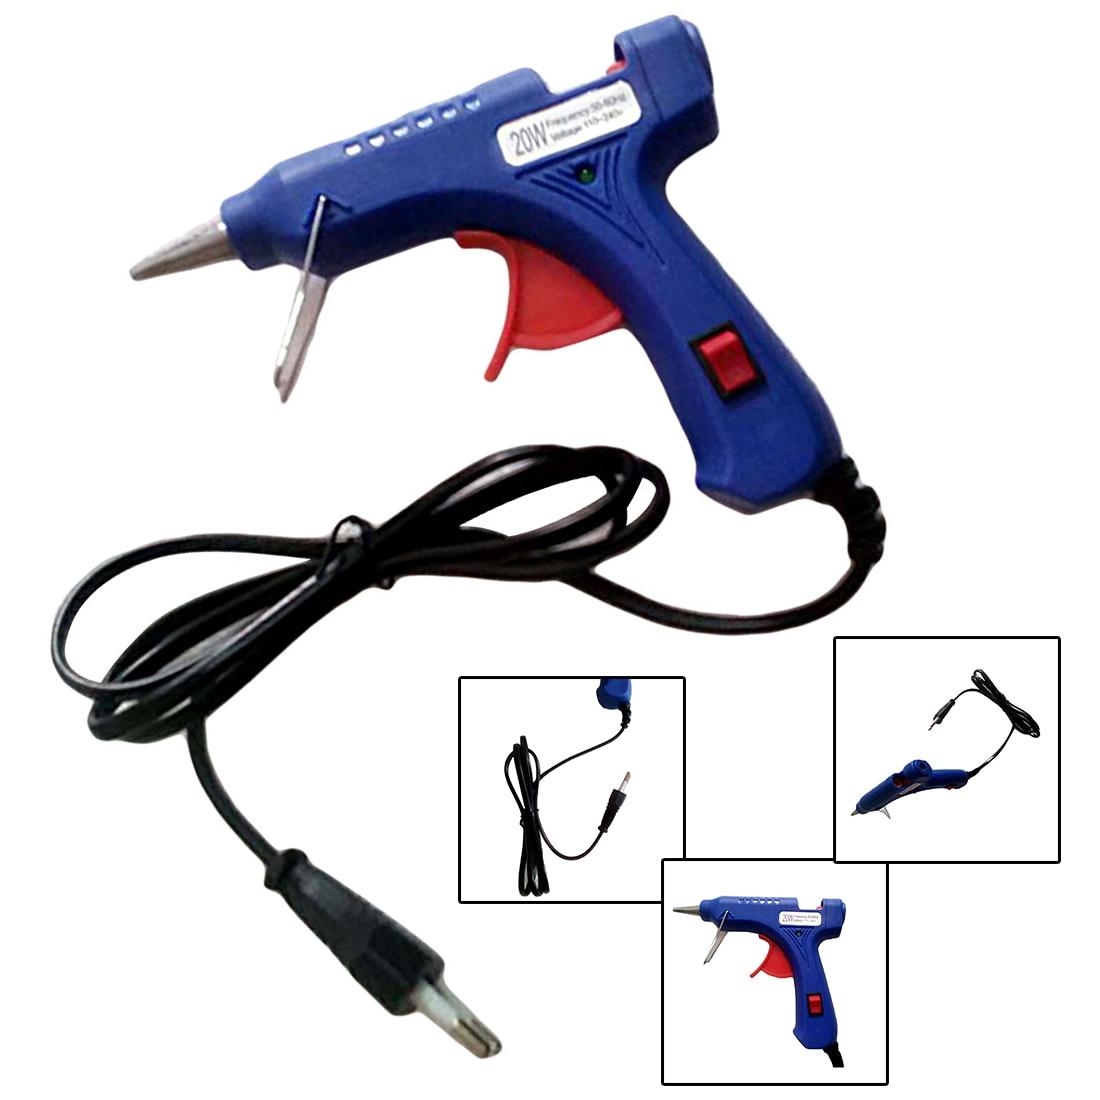 1Pcs Electric Heat Temperature Tool 20W EU Plug Hot Melt Glue Gun Industrial Mini Guns Thermo